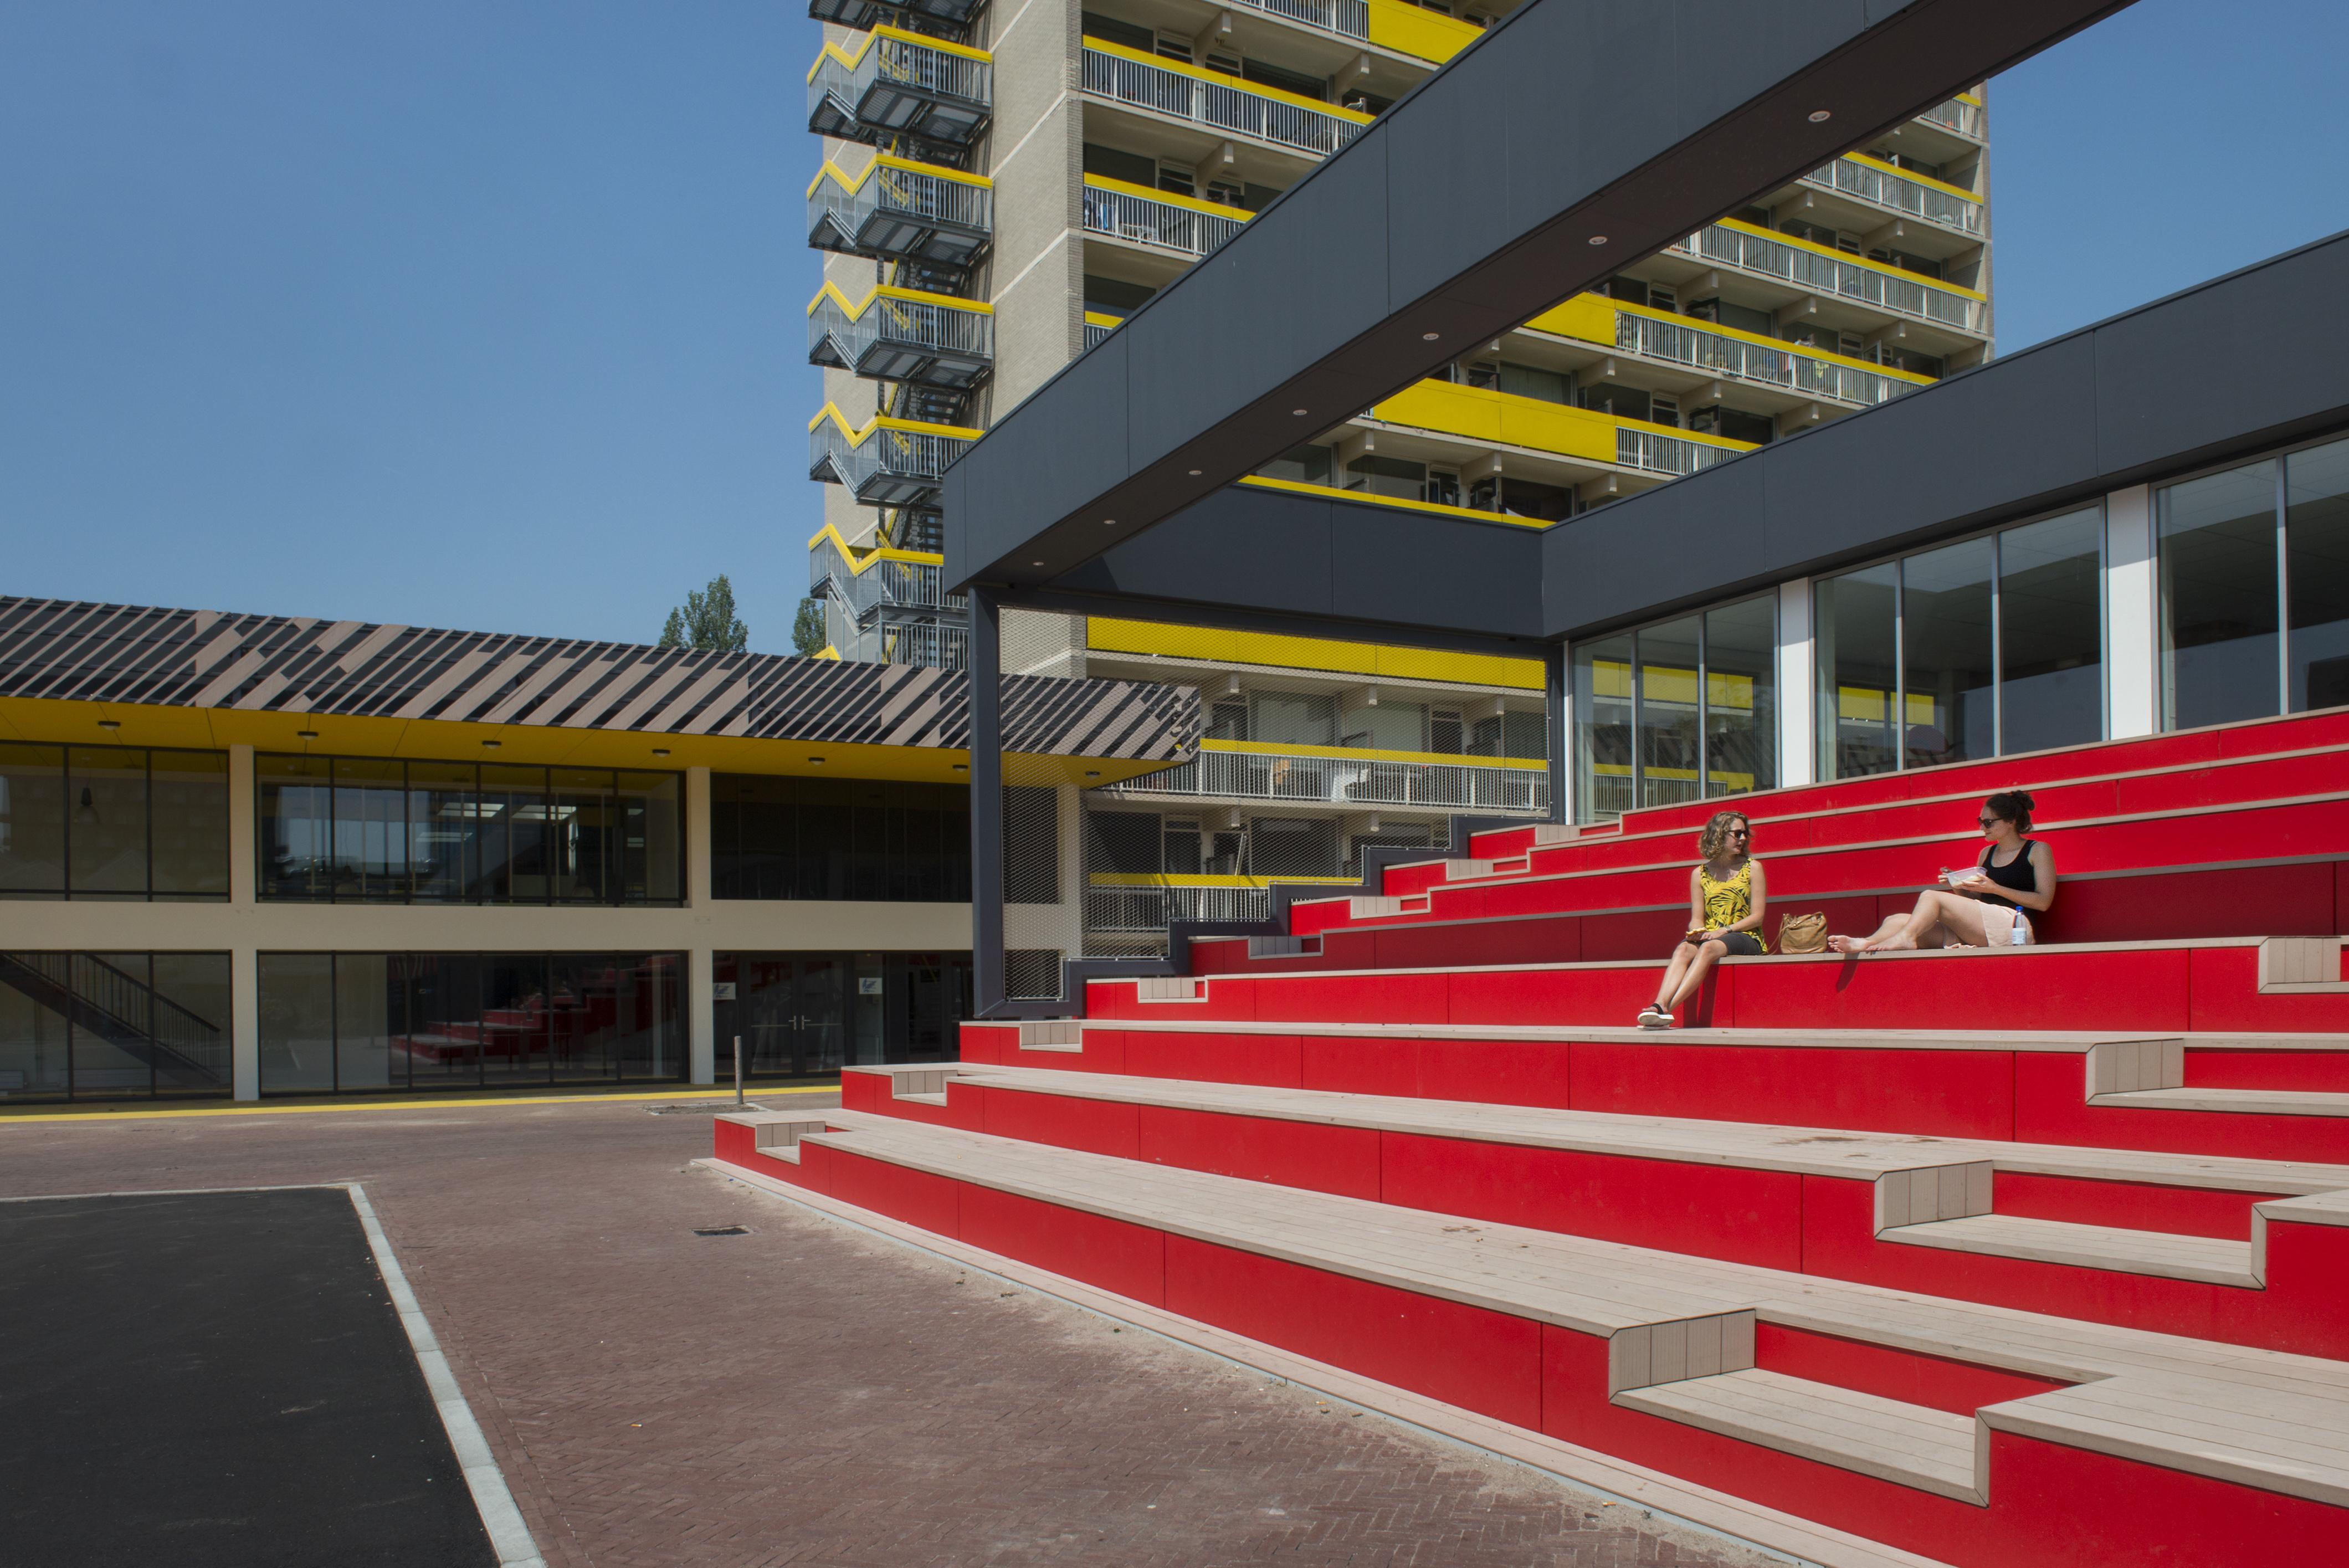 Campus Uilenstede, NEXT Architects / Lodewijk Baljon Landschapsarchitecten